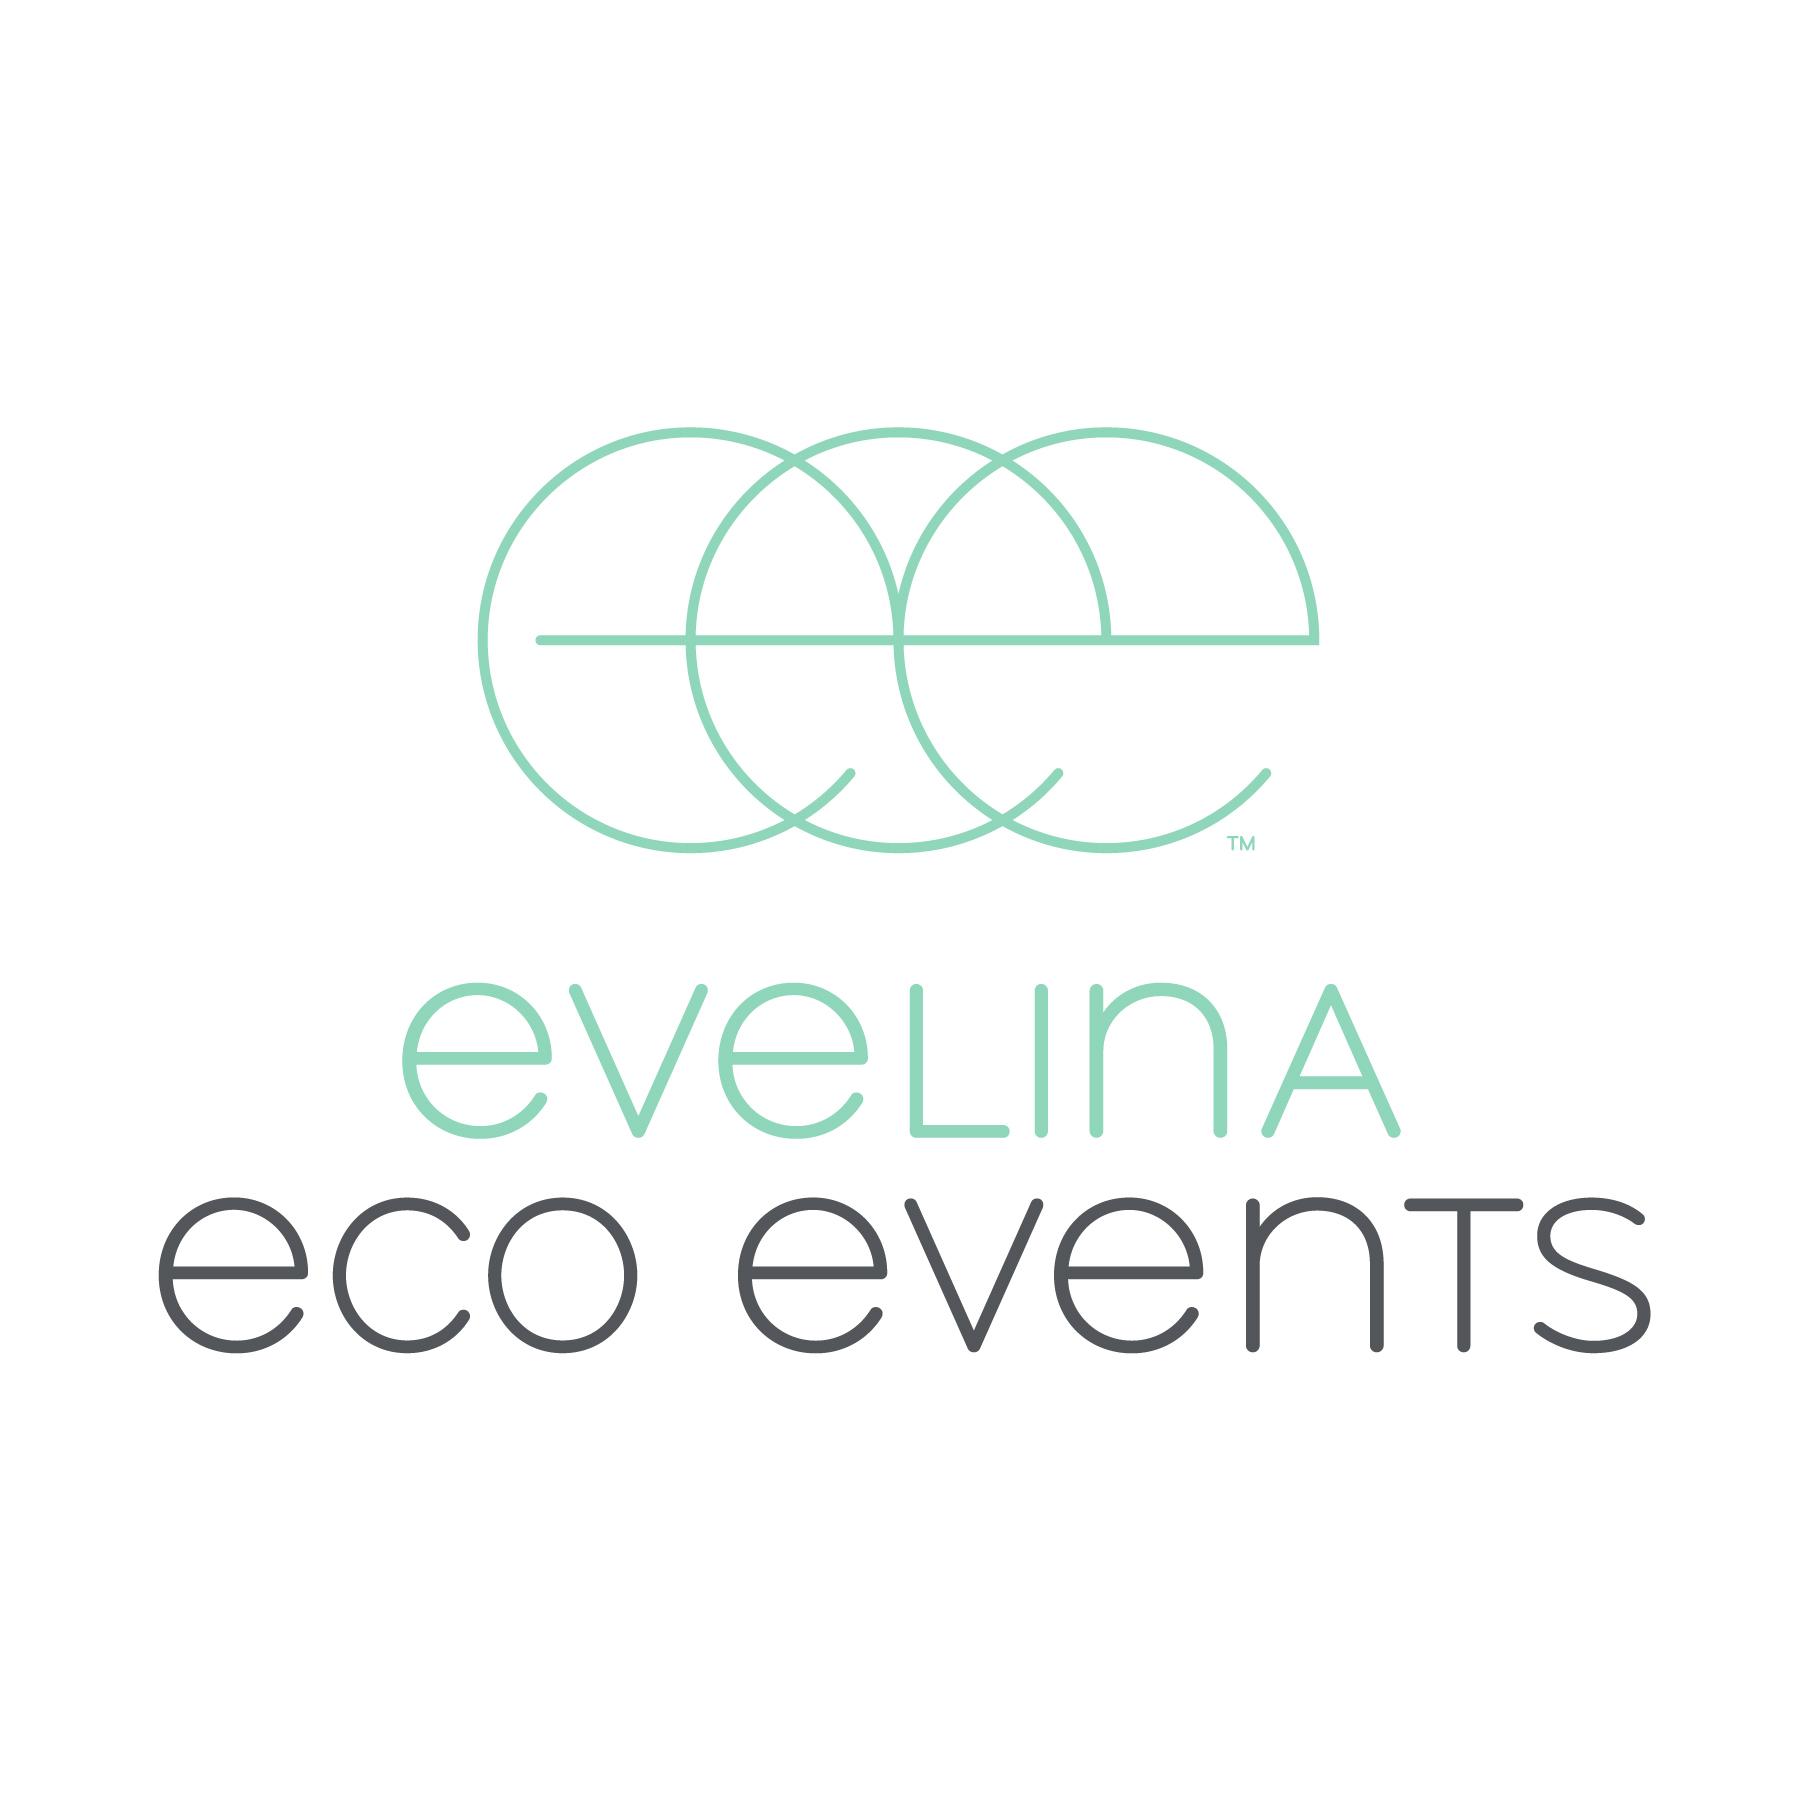 Evelina Eco Events - Evelina Eco Events